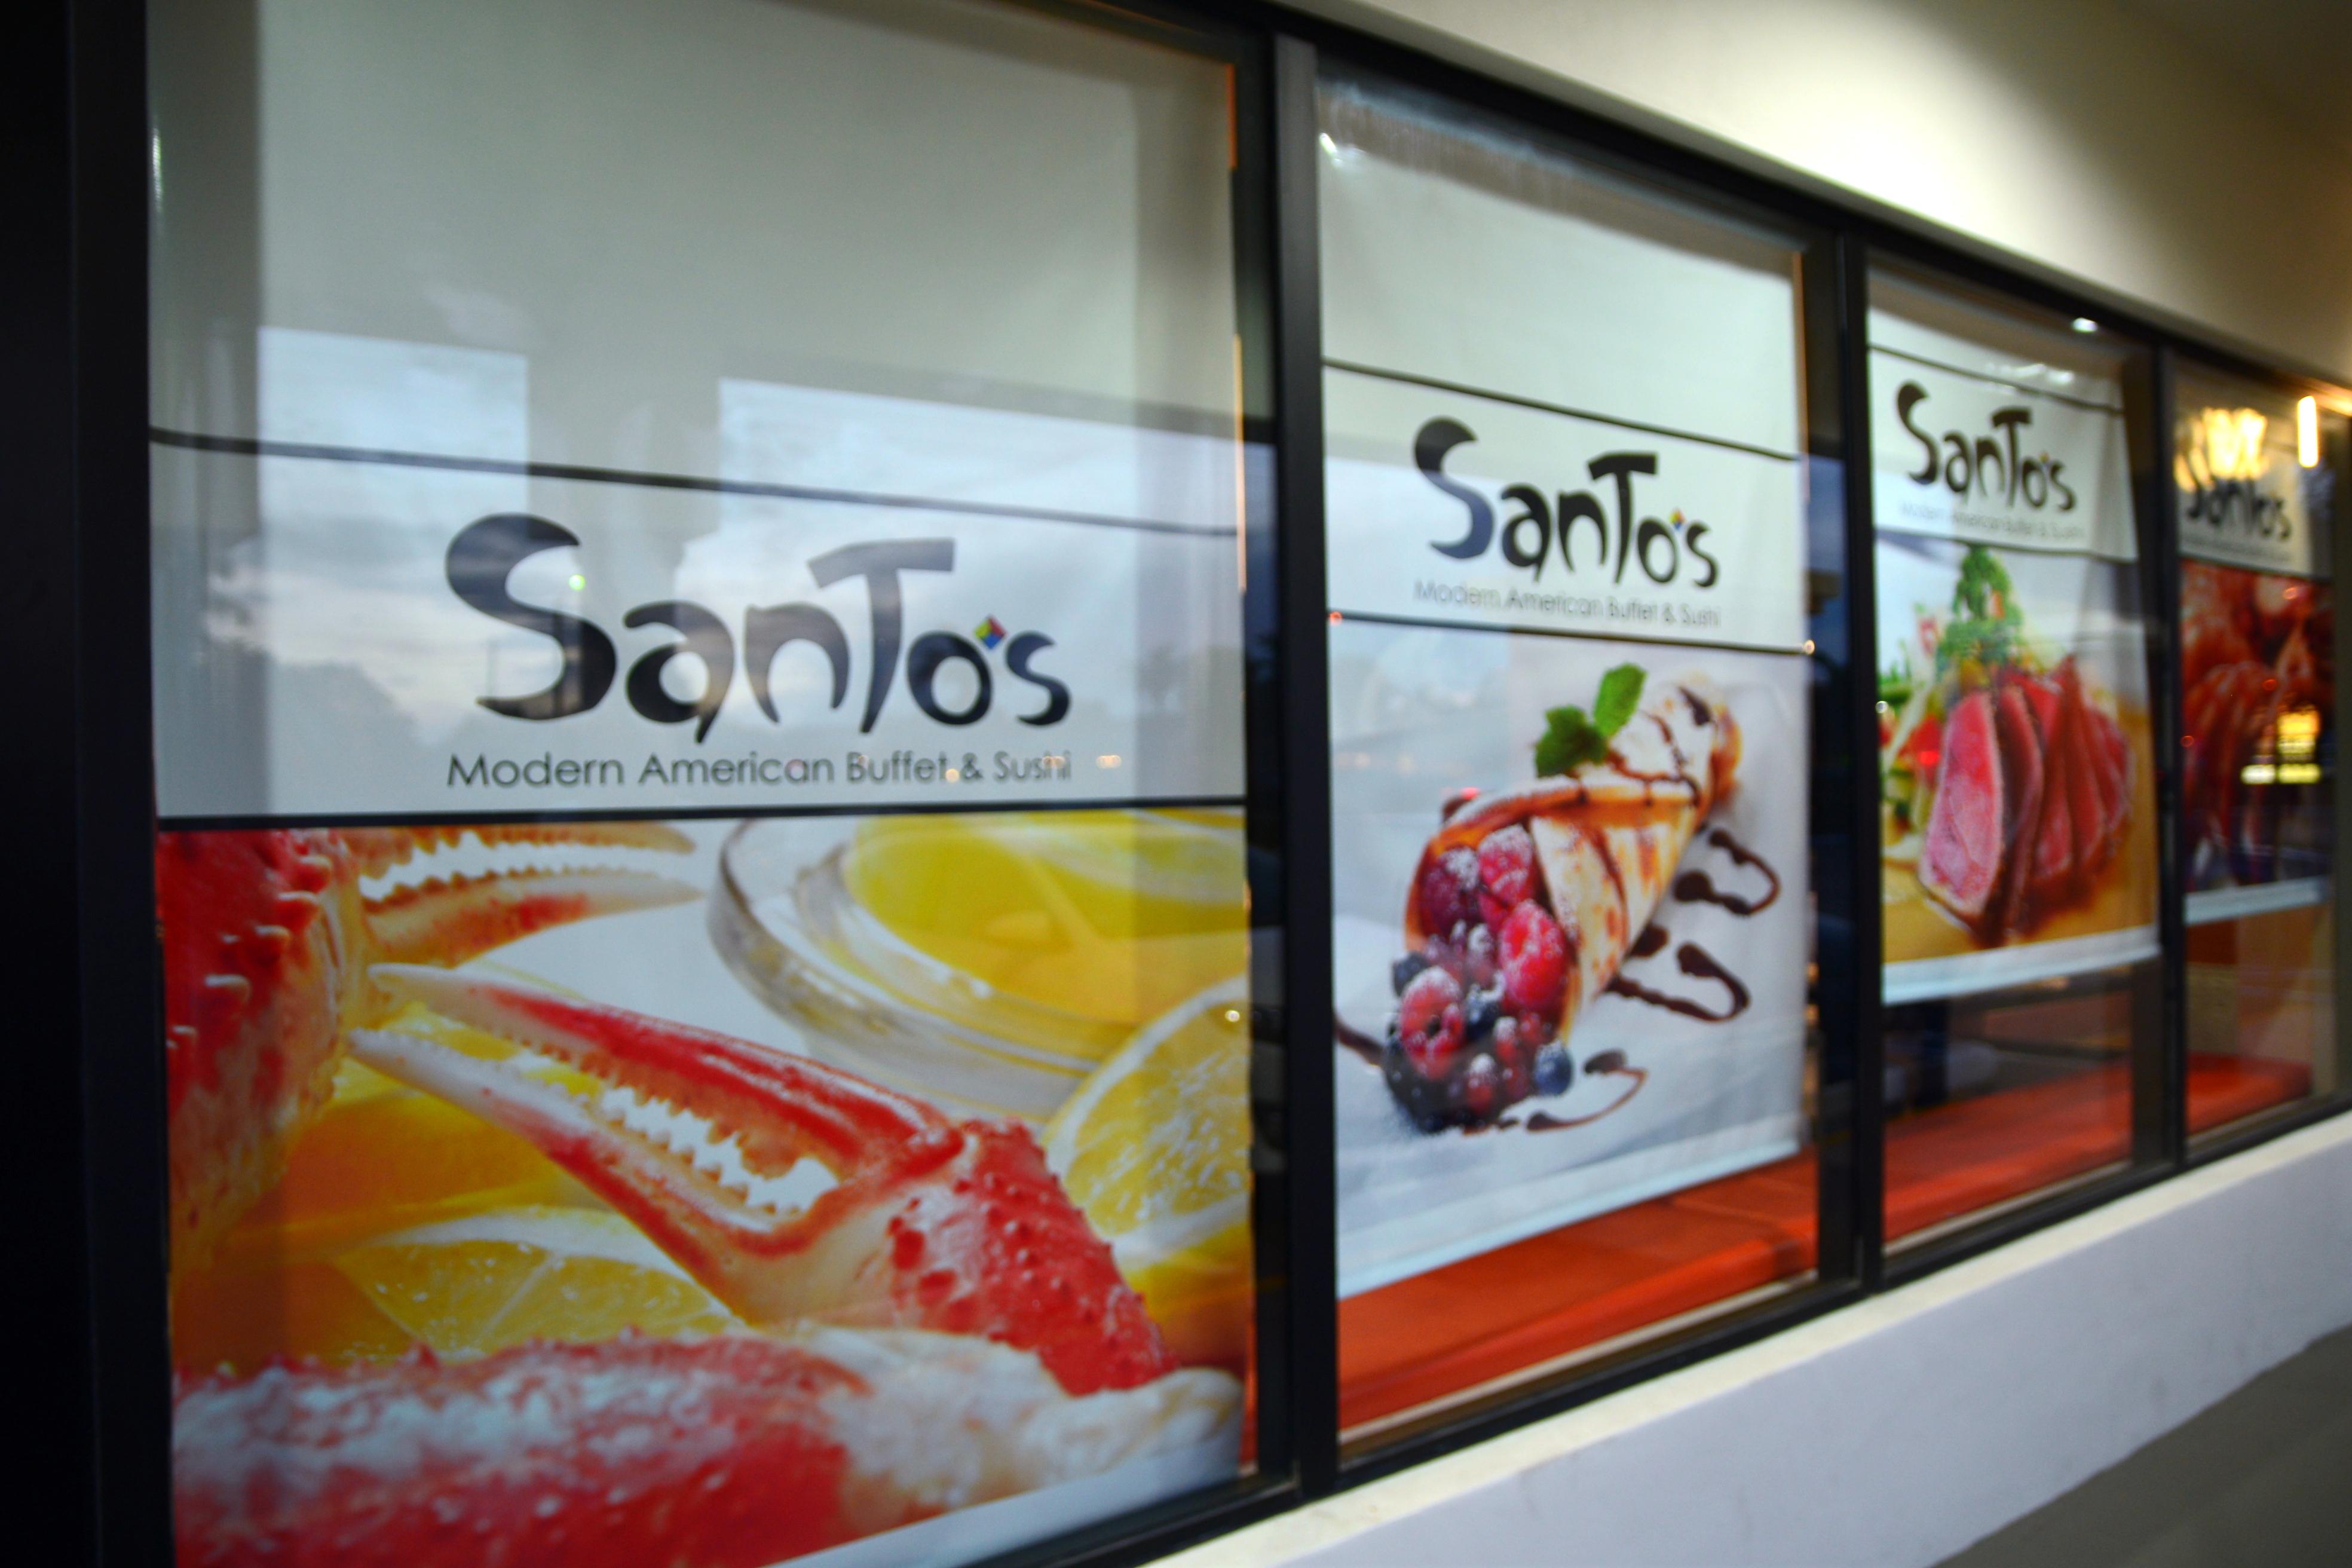 SanTo's Modern American Buffet & Sushi image 0